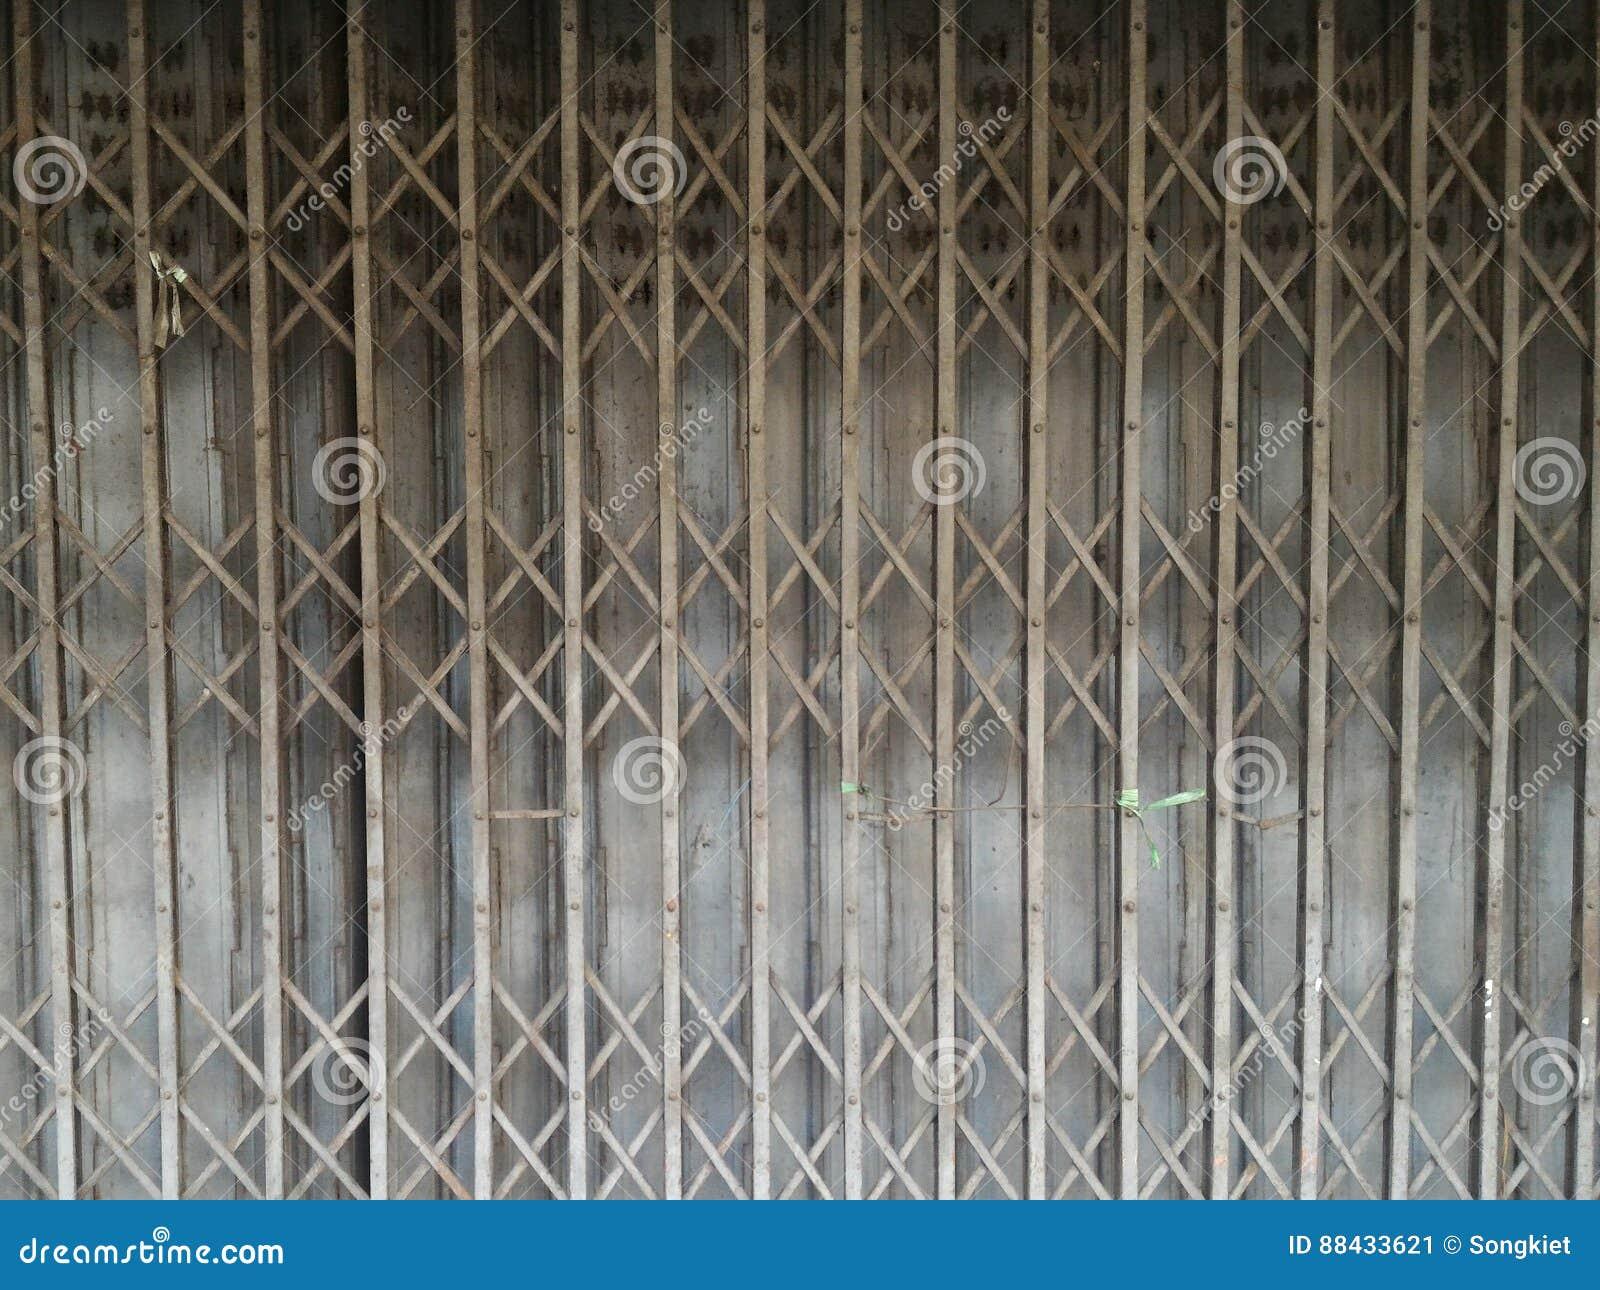 Rusted Metal Folding Door stock image. Image of sliding - 88433621